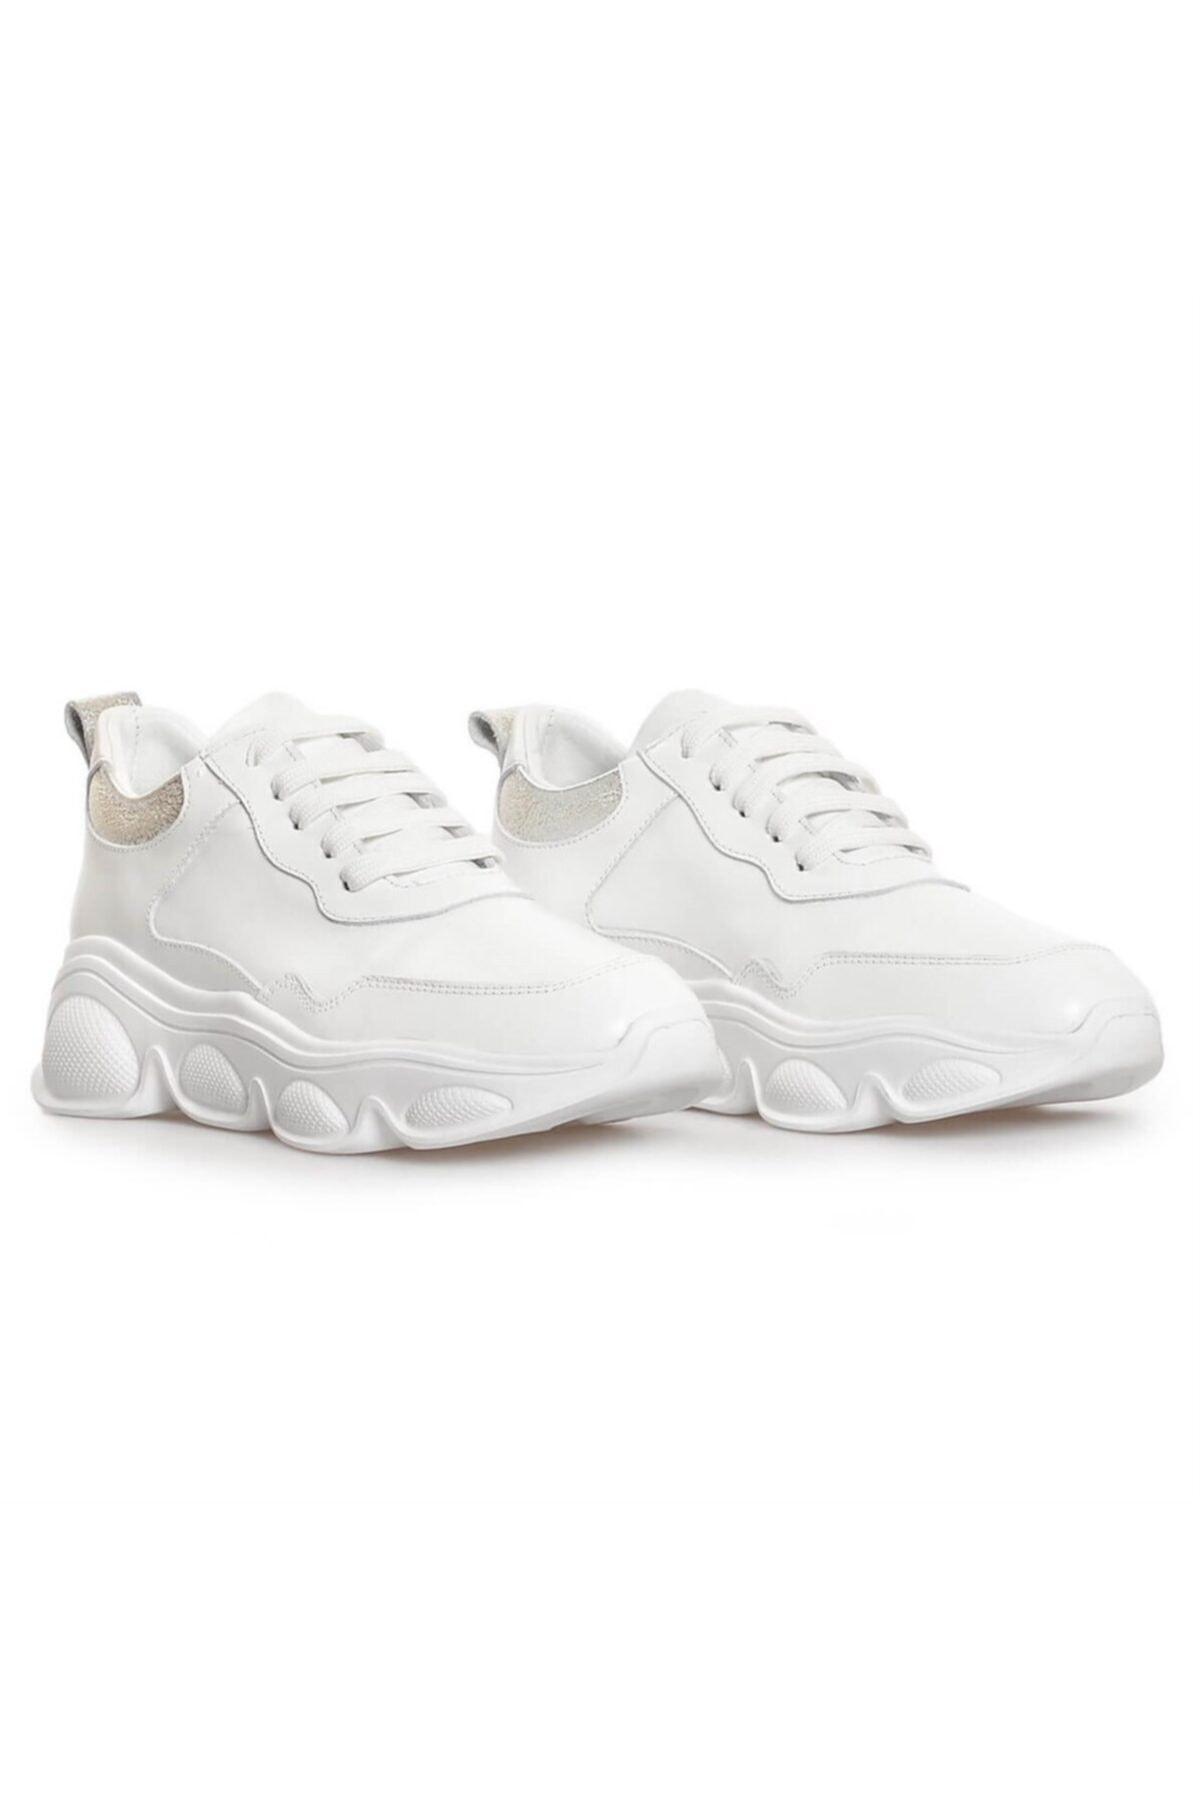 Flower Beyaz Kombin Kadın Sneakers 2